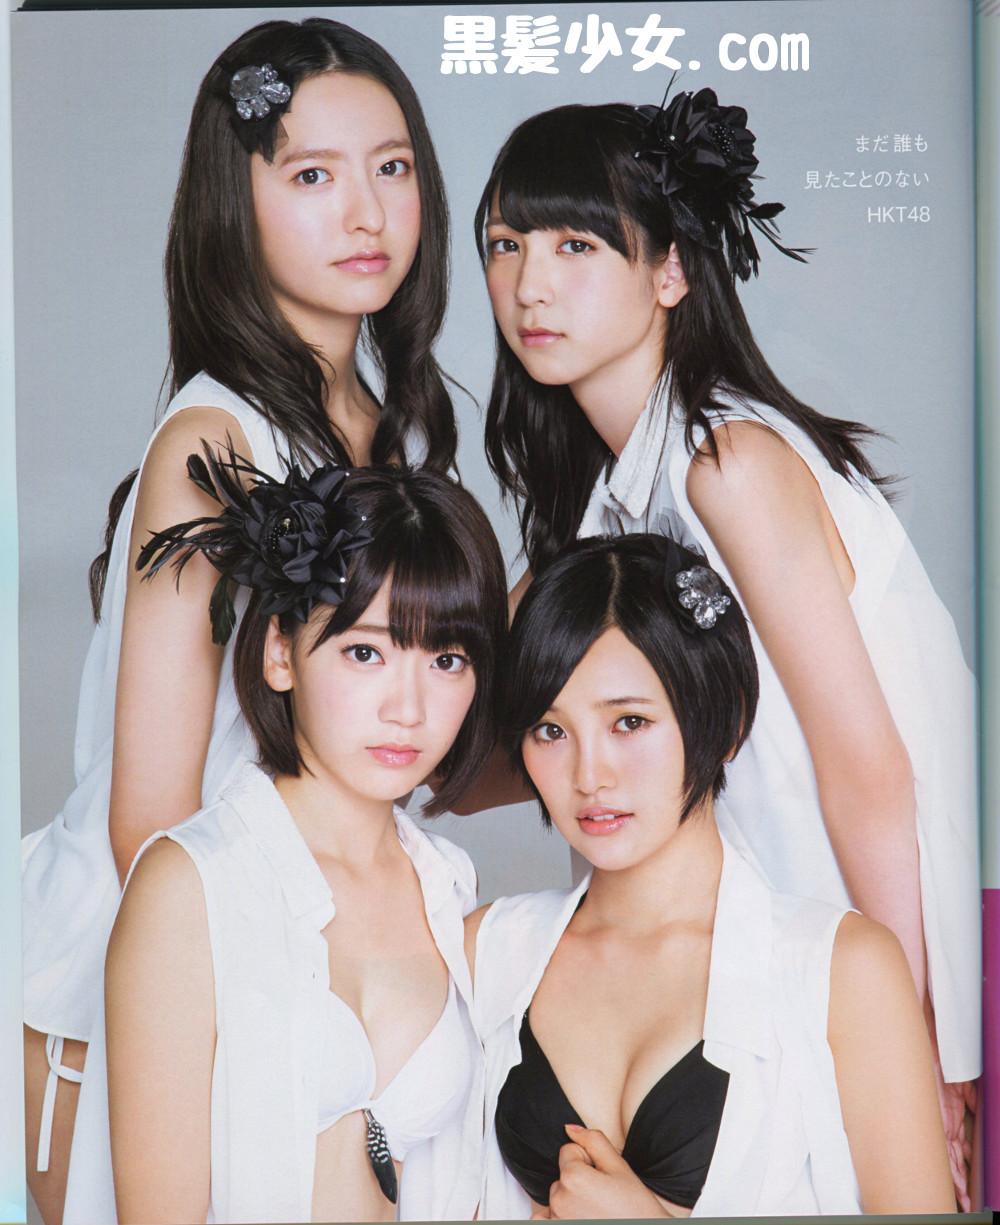 BOMB2014年10月号 HKT48宮脇咲良 兒玉遥 森保まどか 松岡菜摘 (1)